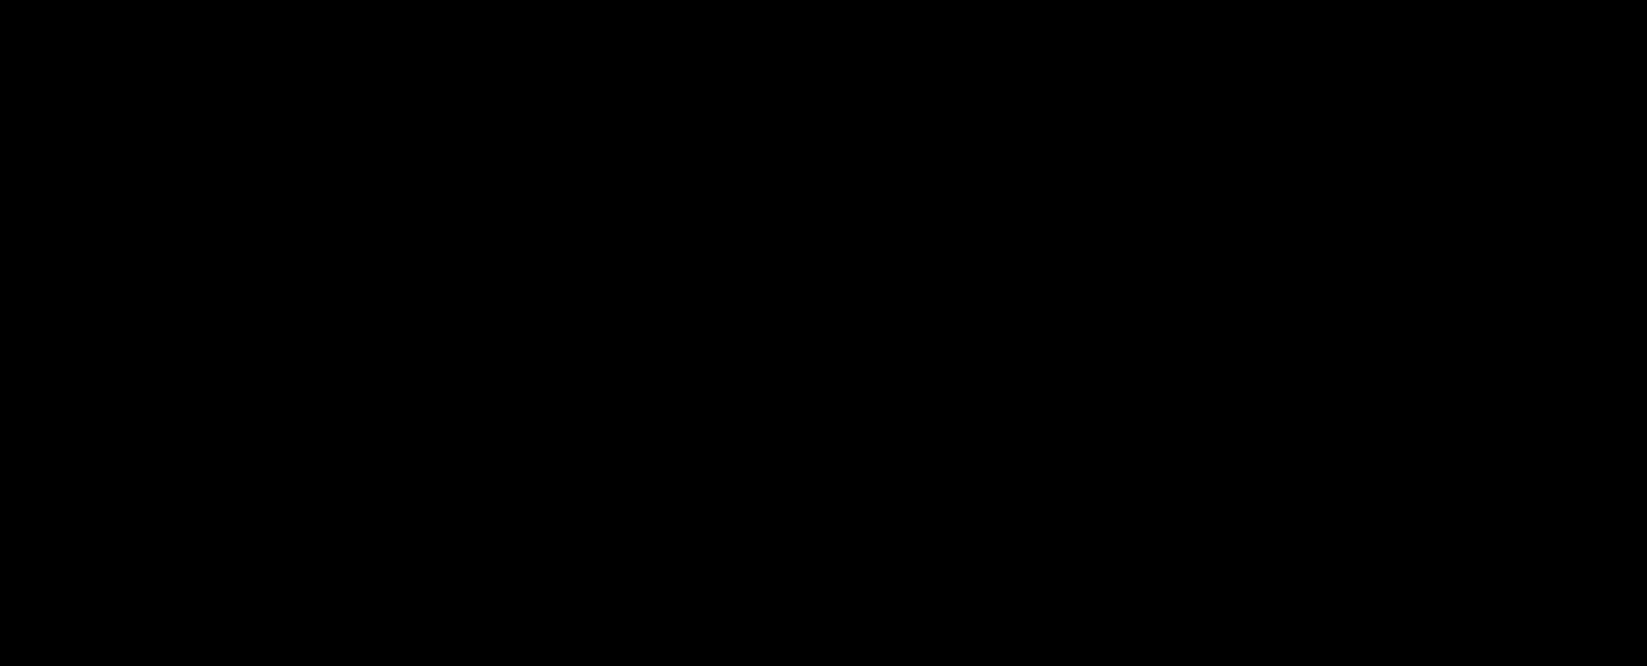 A-887826